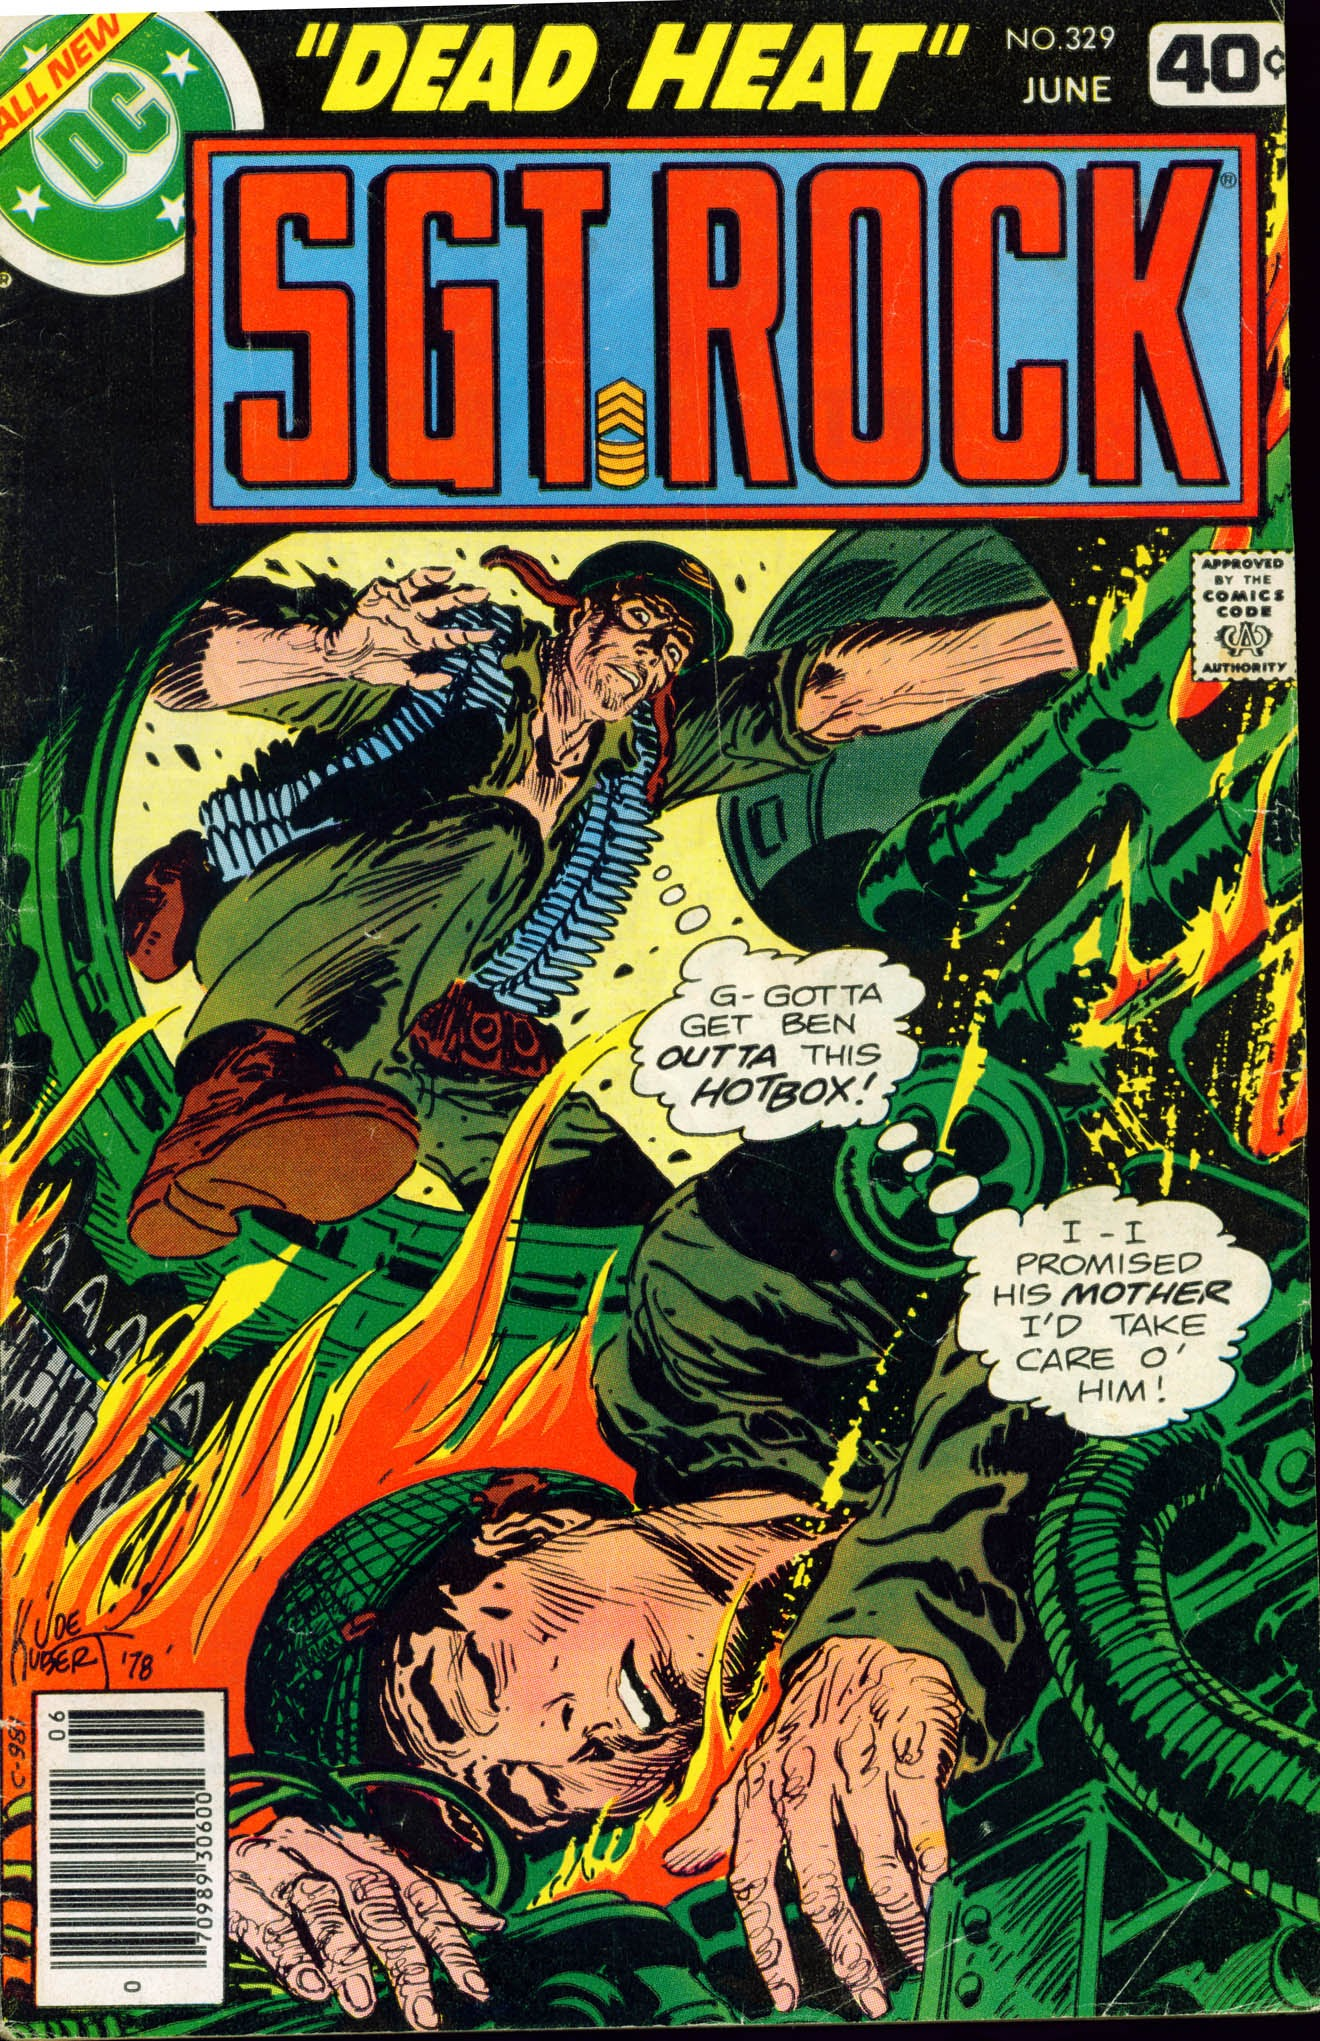 Read online Sgt. Rock comic -  Issue #329 - 1